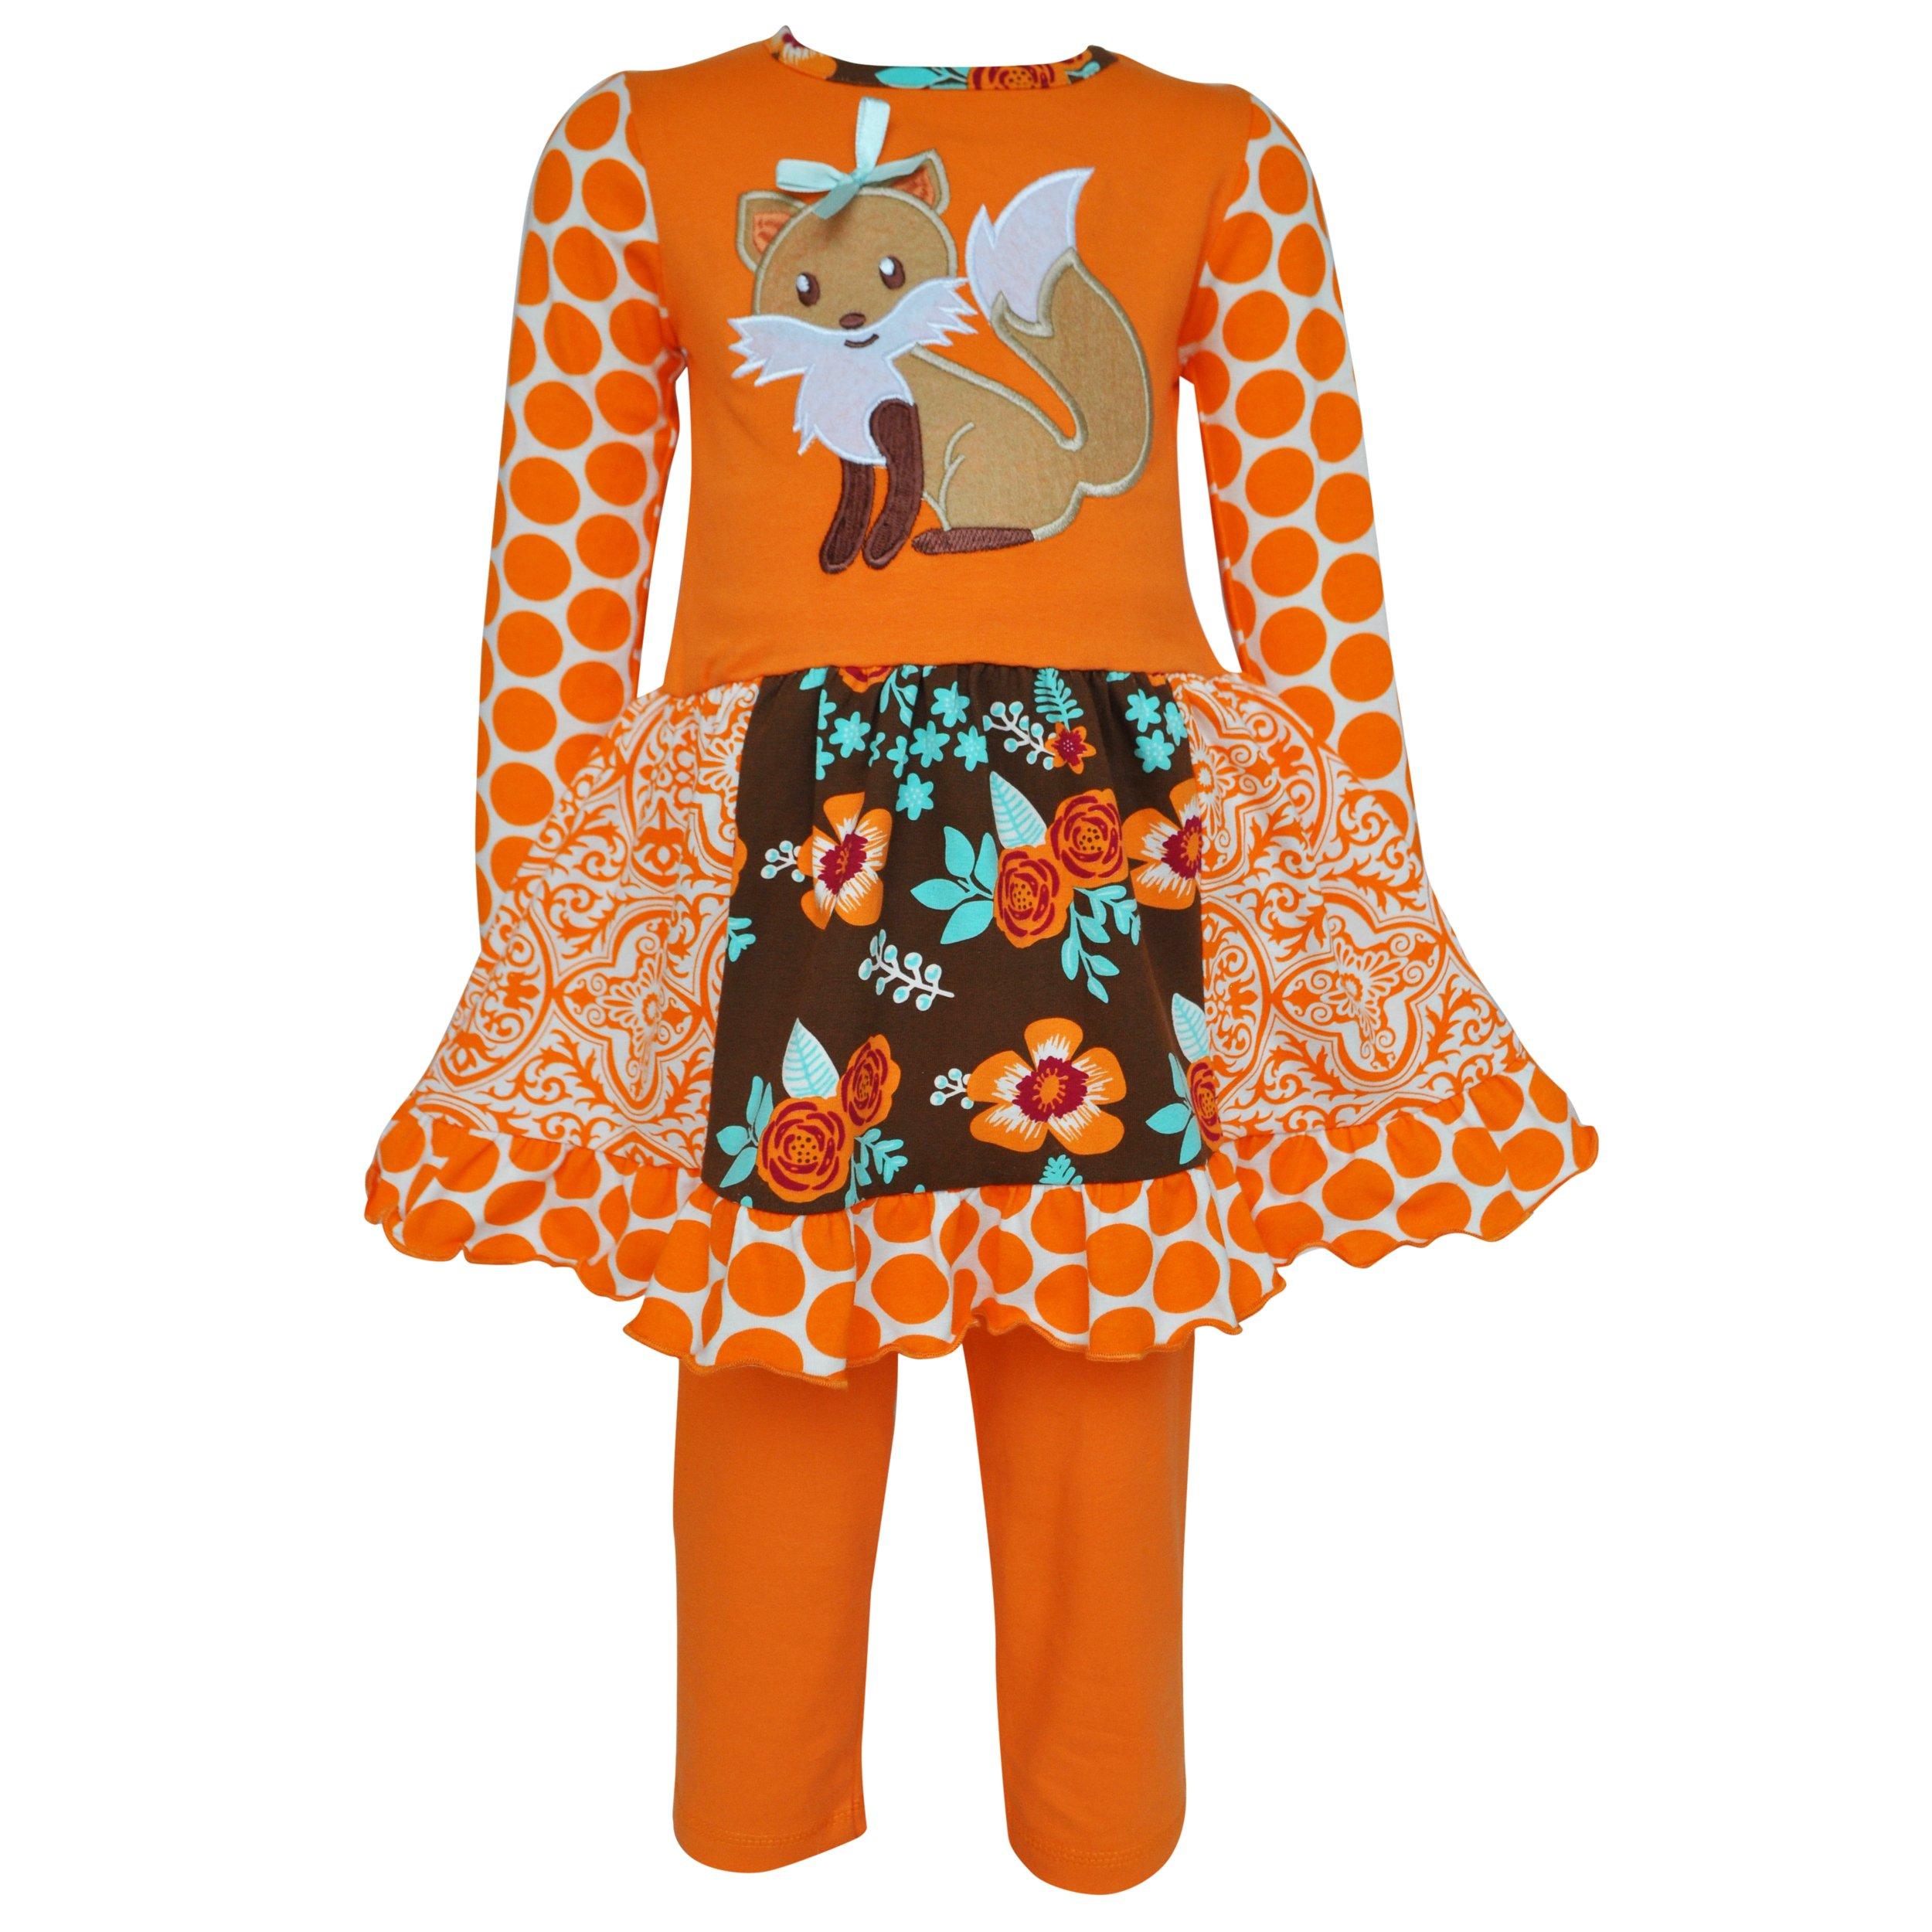 AnnLoren Little Girls 6/6X Boutique Foxy Floral Dress and Legging Clothing Set